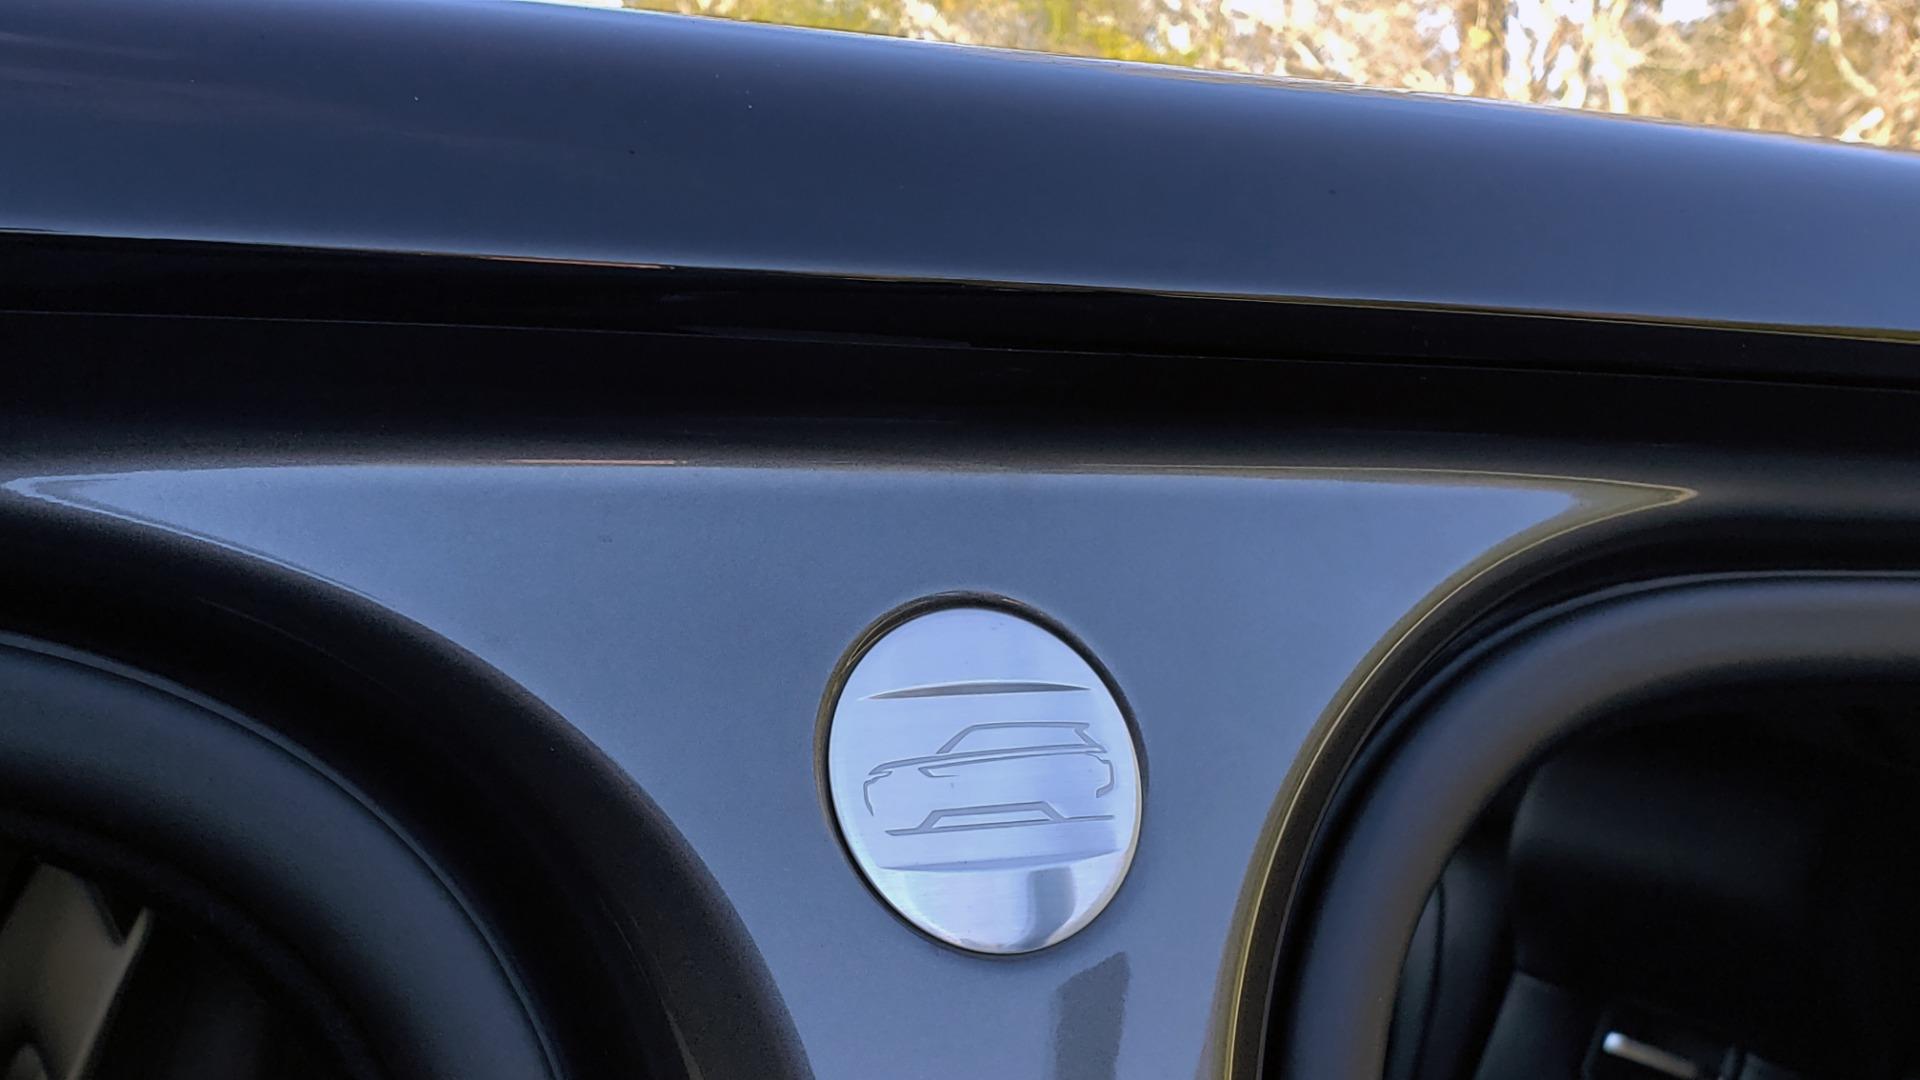 Used 2018 Land Rover RANGE ROVER SPORT DYNAMIC SC V8 / CLIMATE CMFRT / VISION ASST / MERIDIAN for sale Sold at Formula Imports in Charlotte NC 28227 47